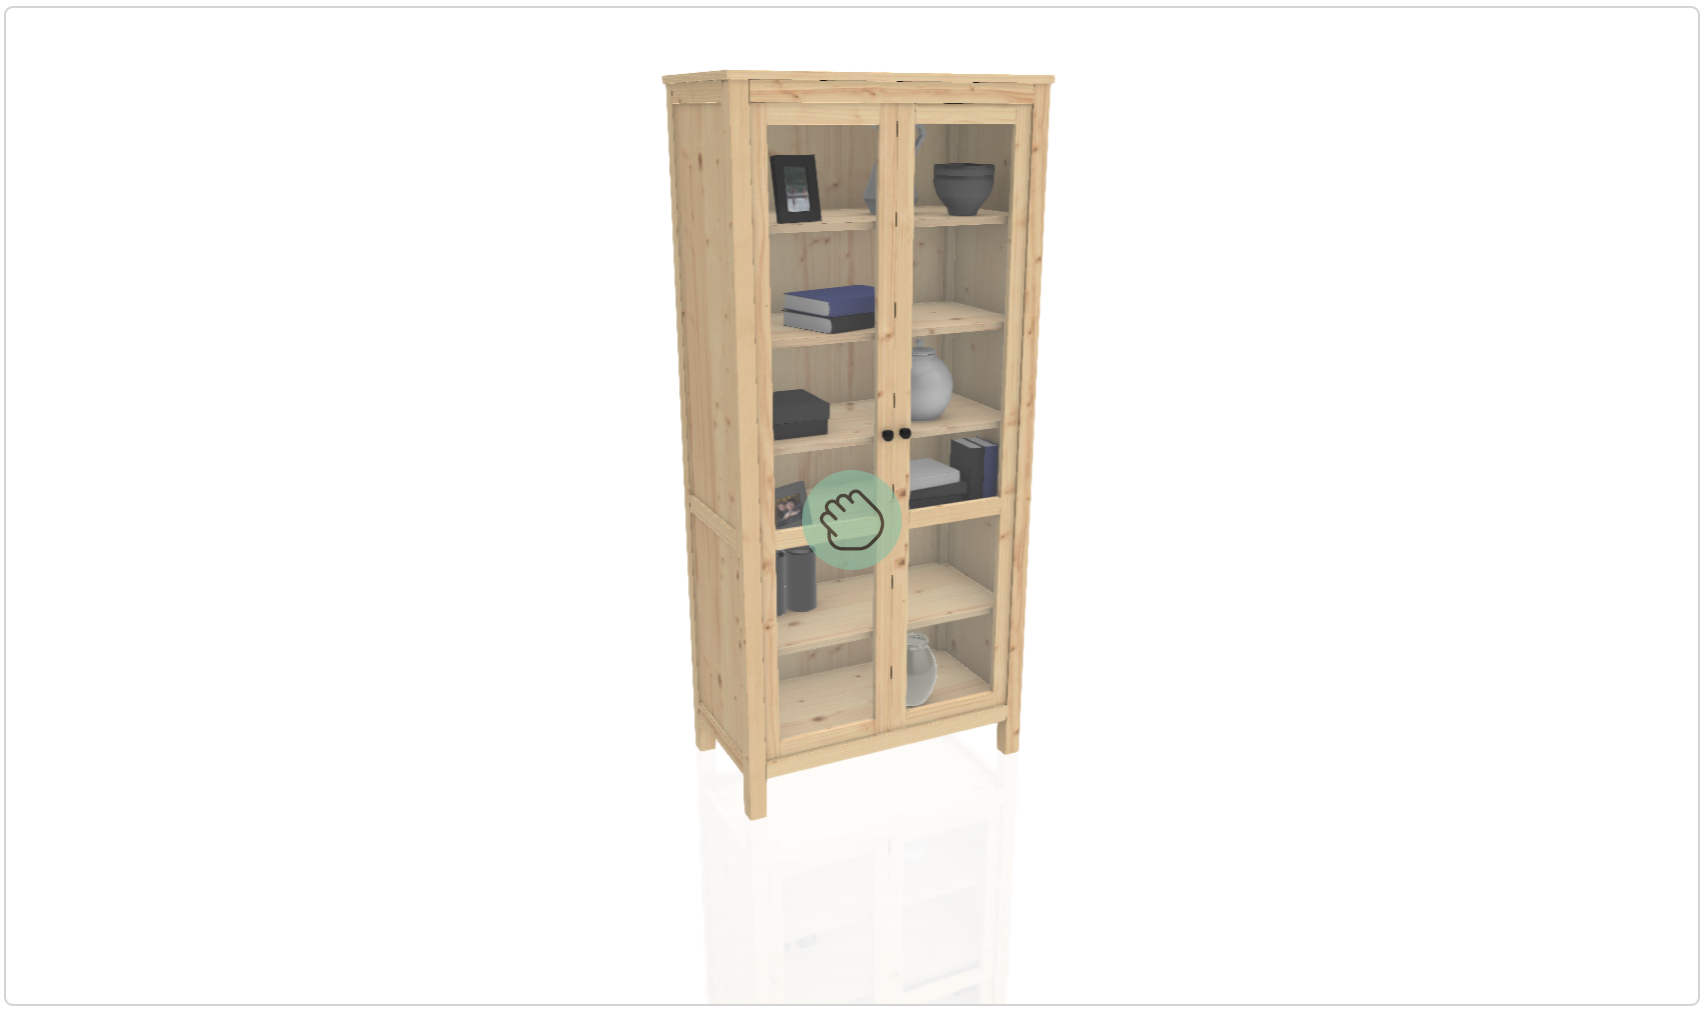 Ikea Cabinet and Bookshelf